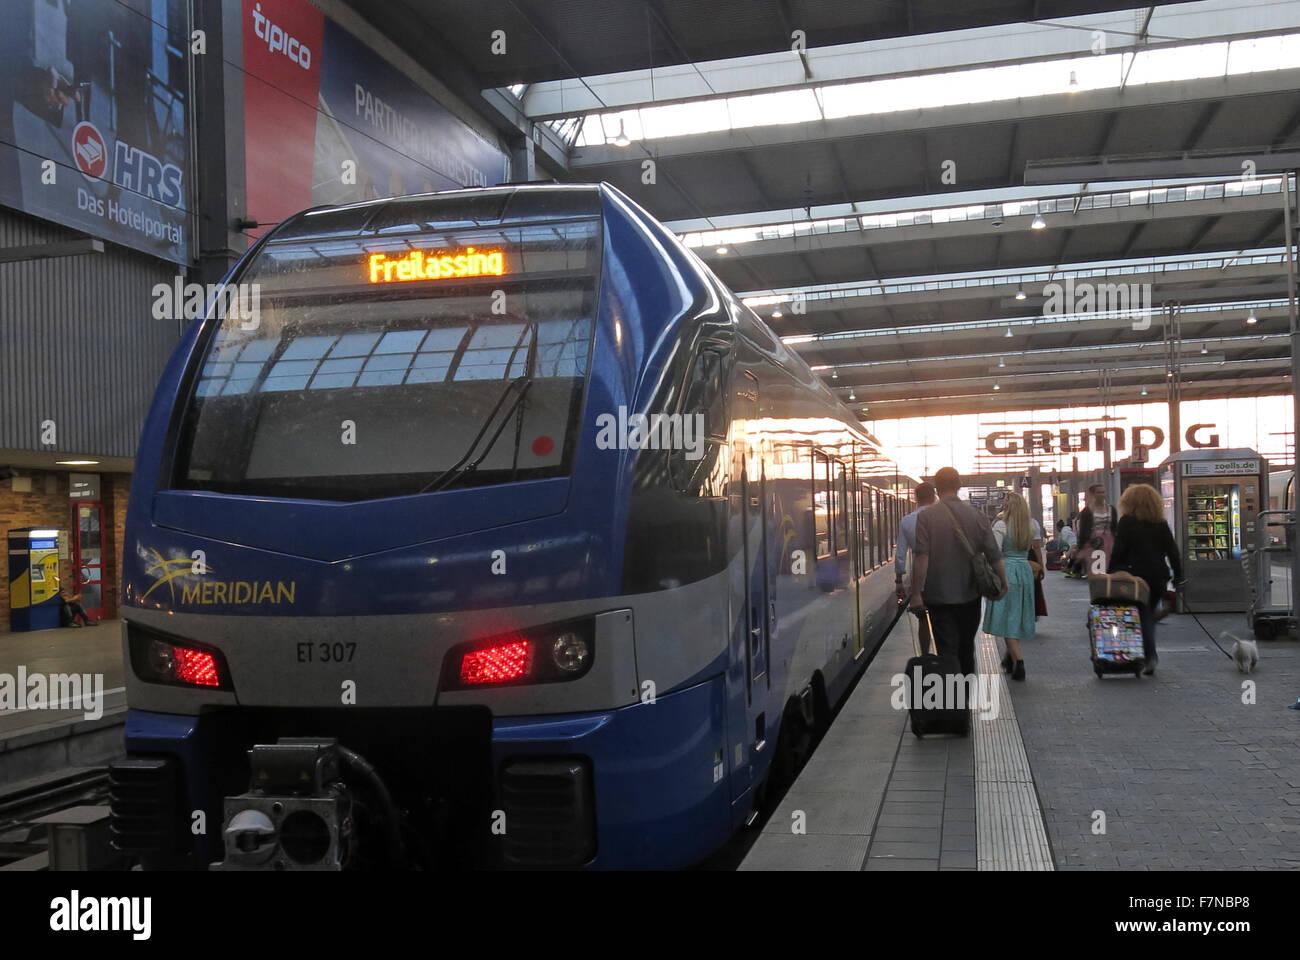 München Hauptbahnhof, blue Meridian Freilassing passenger Train - Stock Image